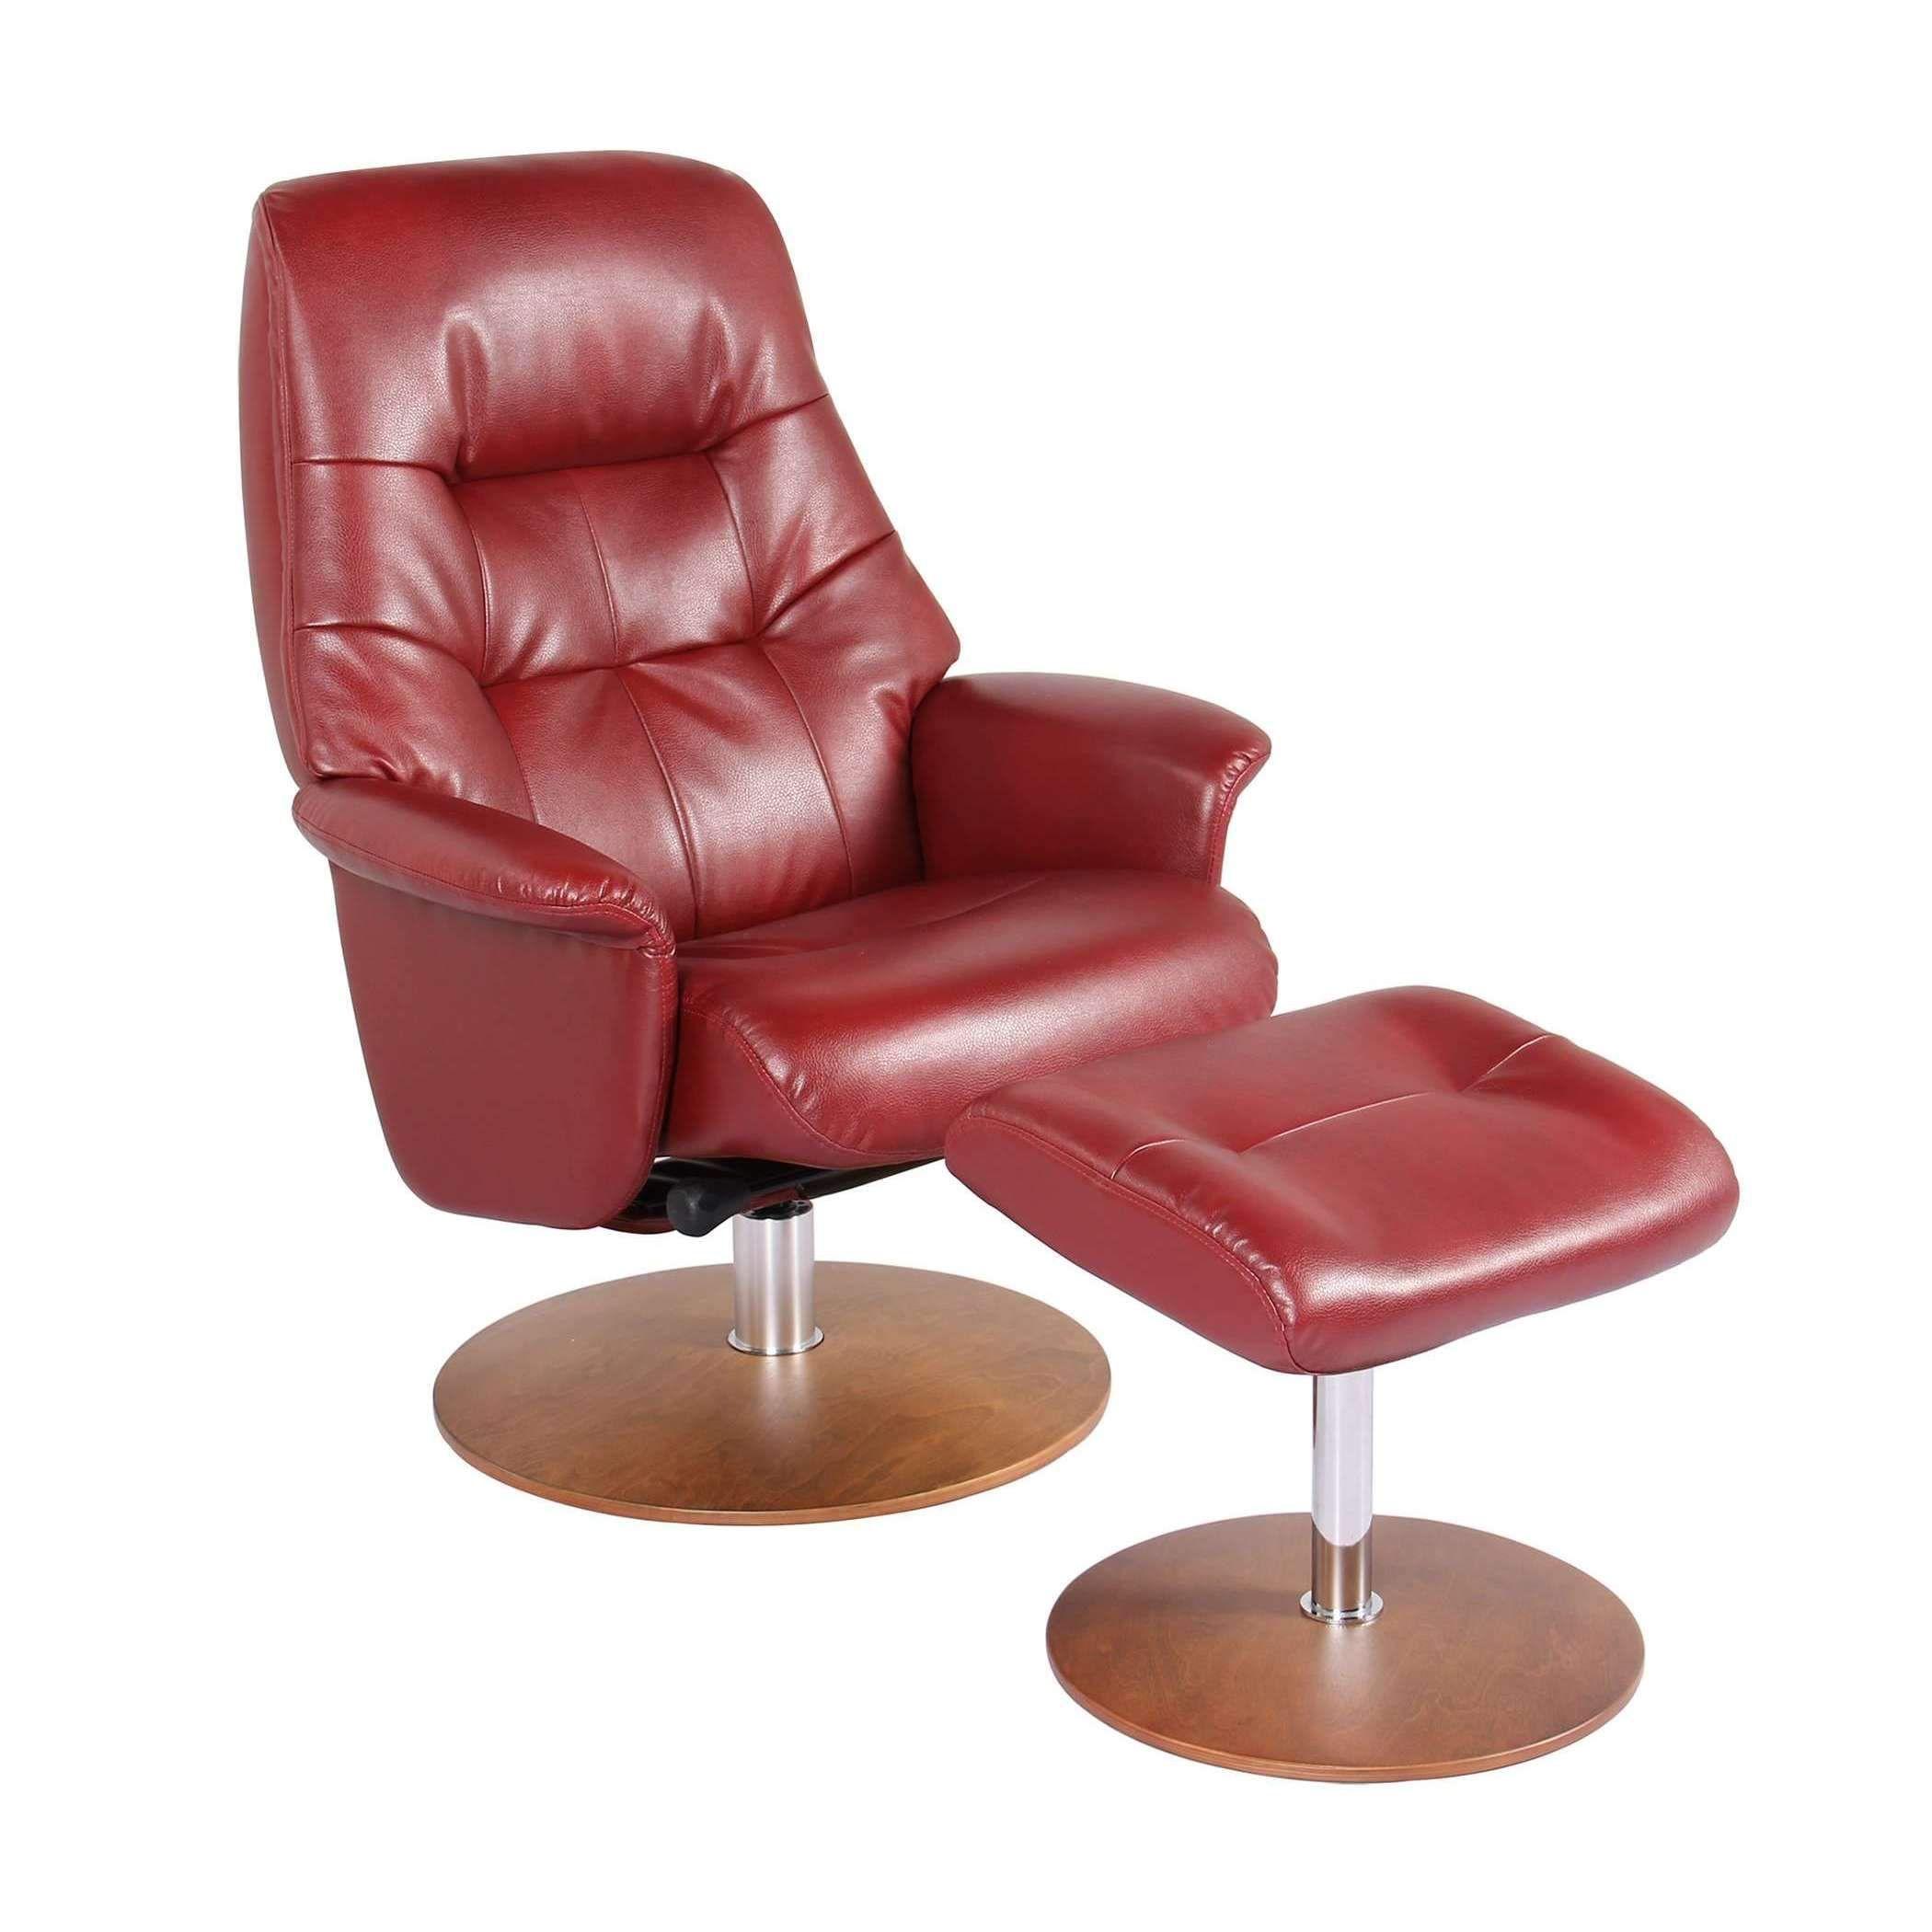 Swivel Recliner Chair & Ottoman Ruby S7667002GP